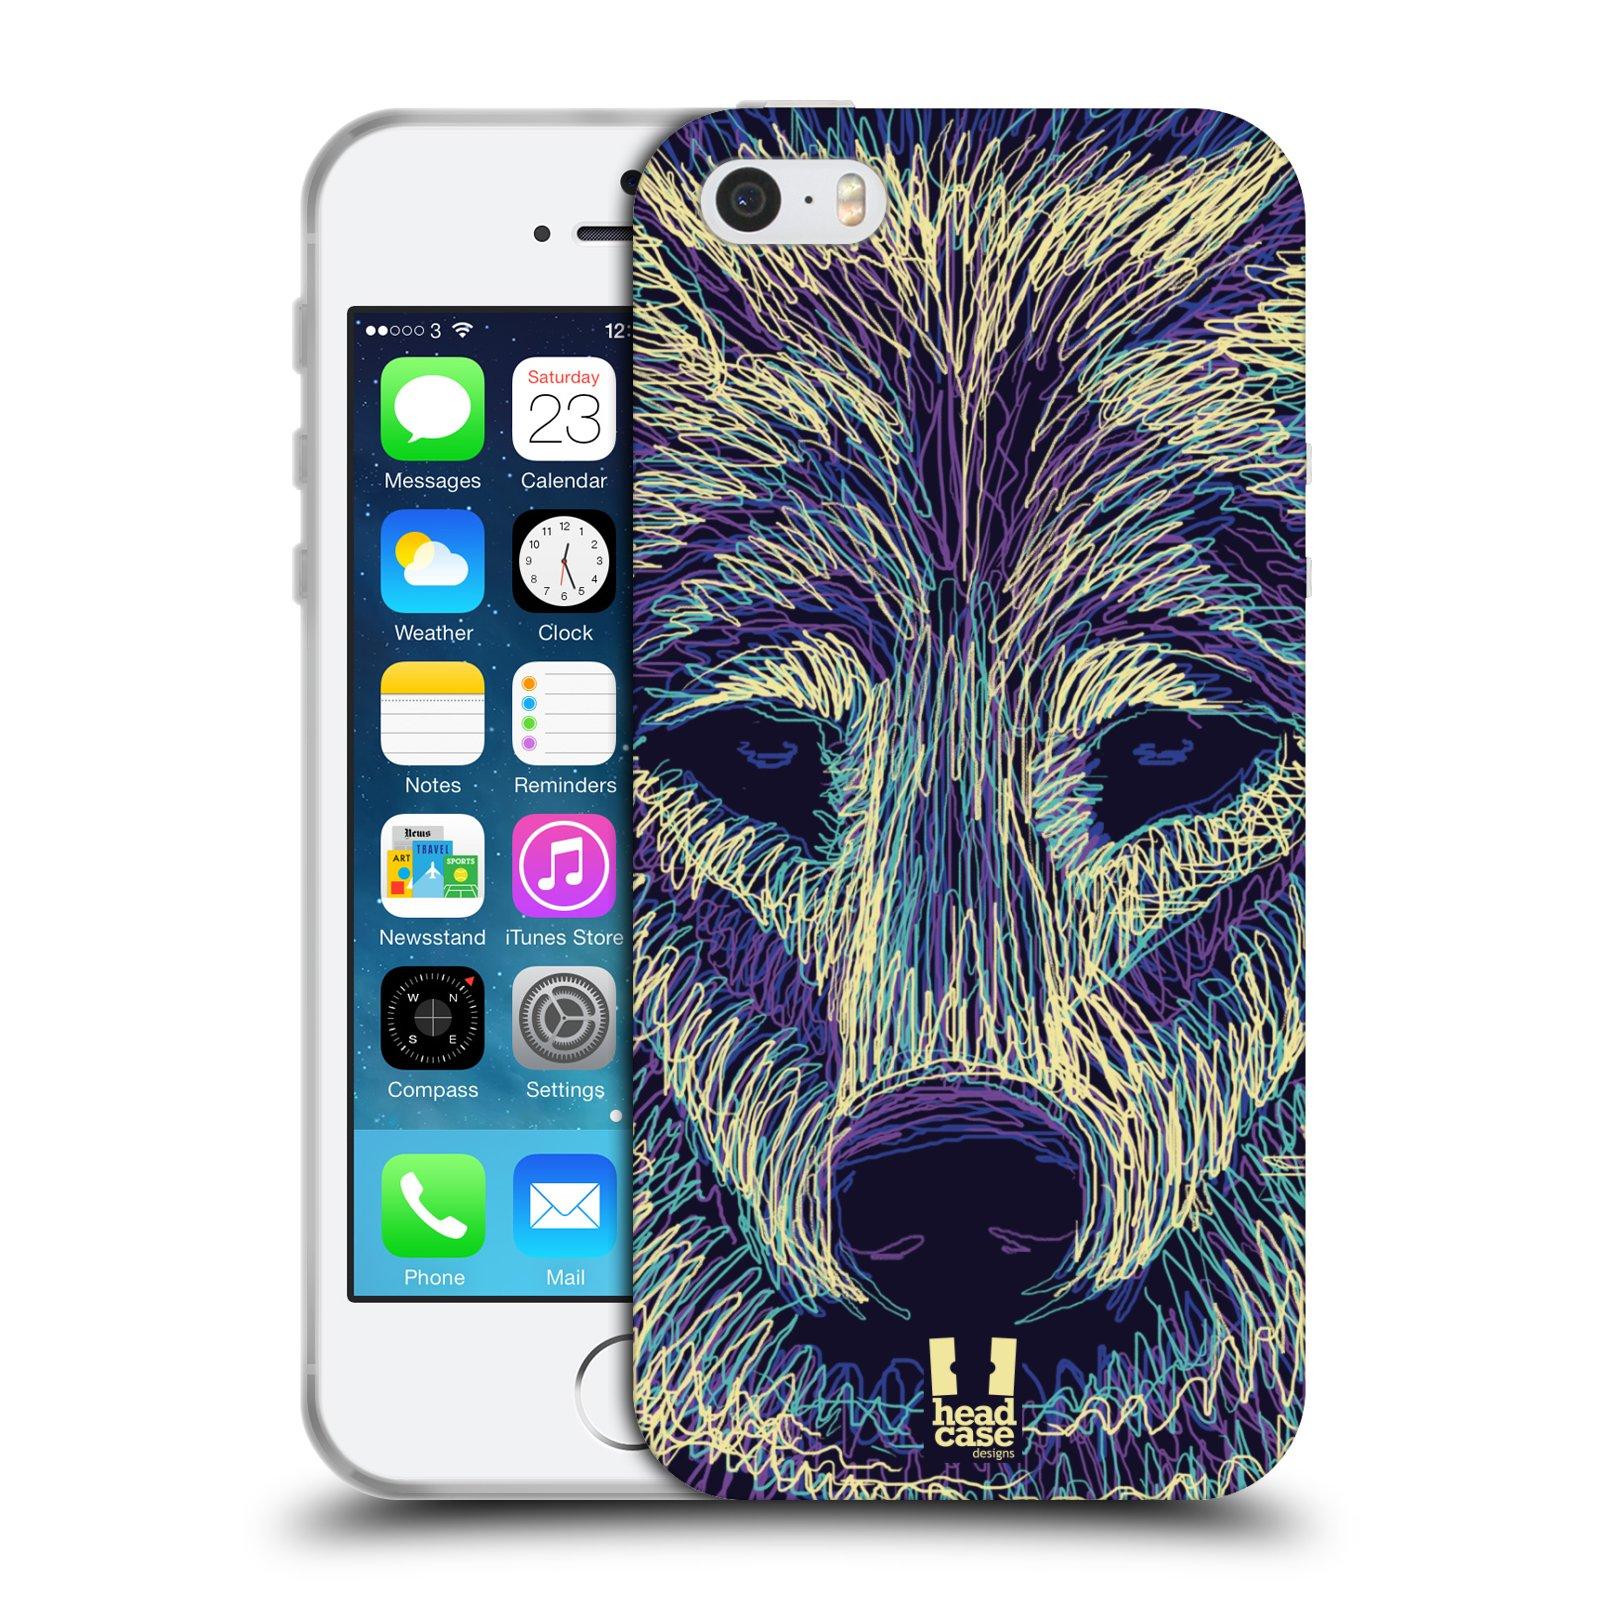 HEAD CASE silikonový obal na mobil Apple Iphone SE vzor zvíře čmáranice vlk bae1f522829